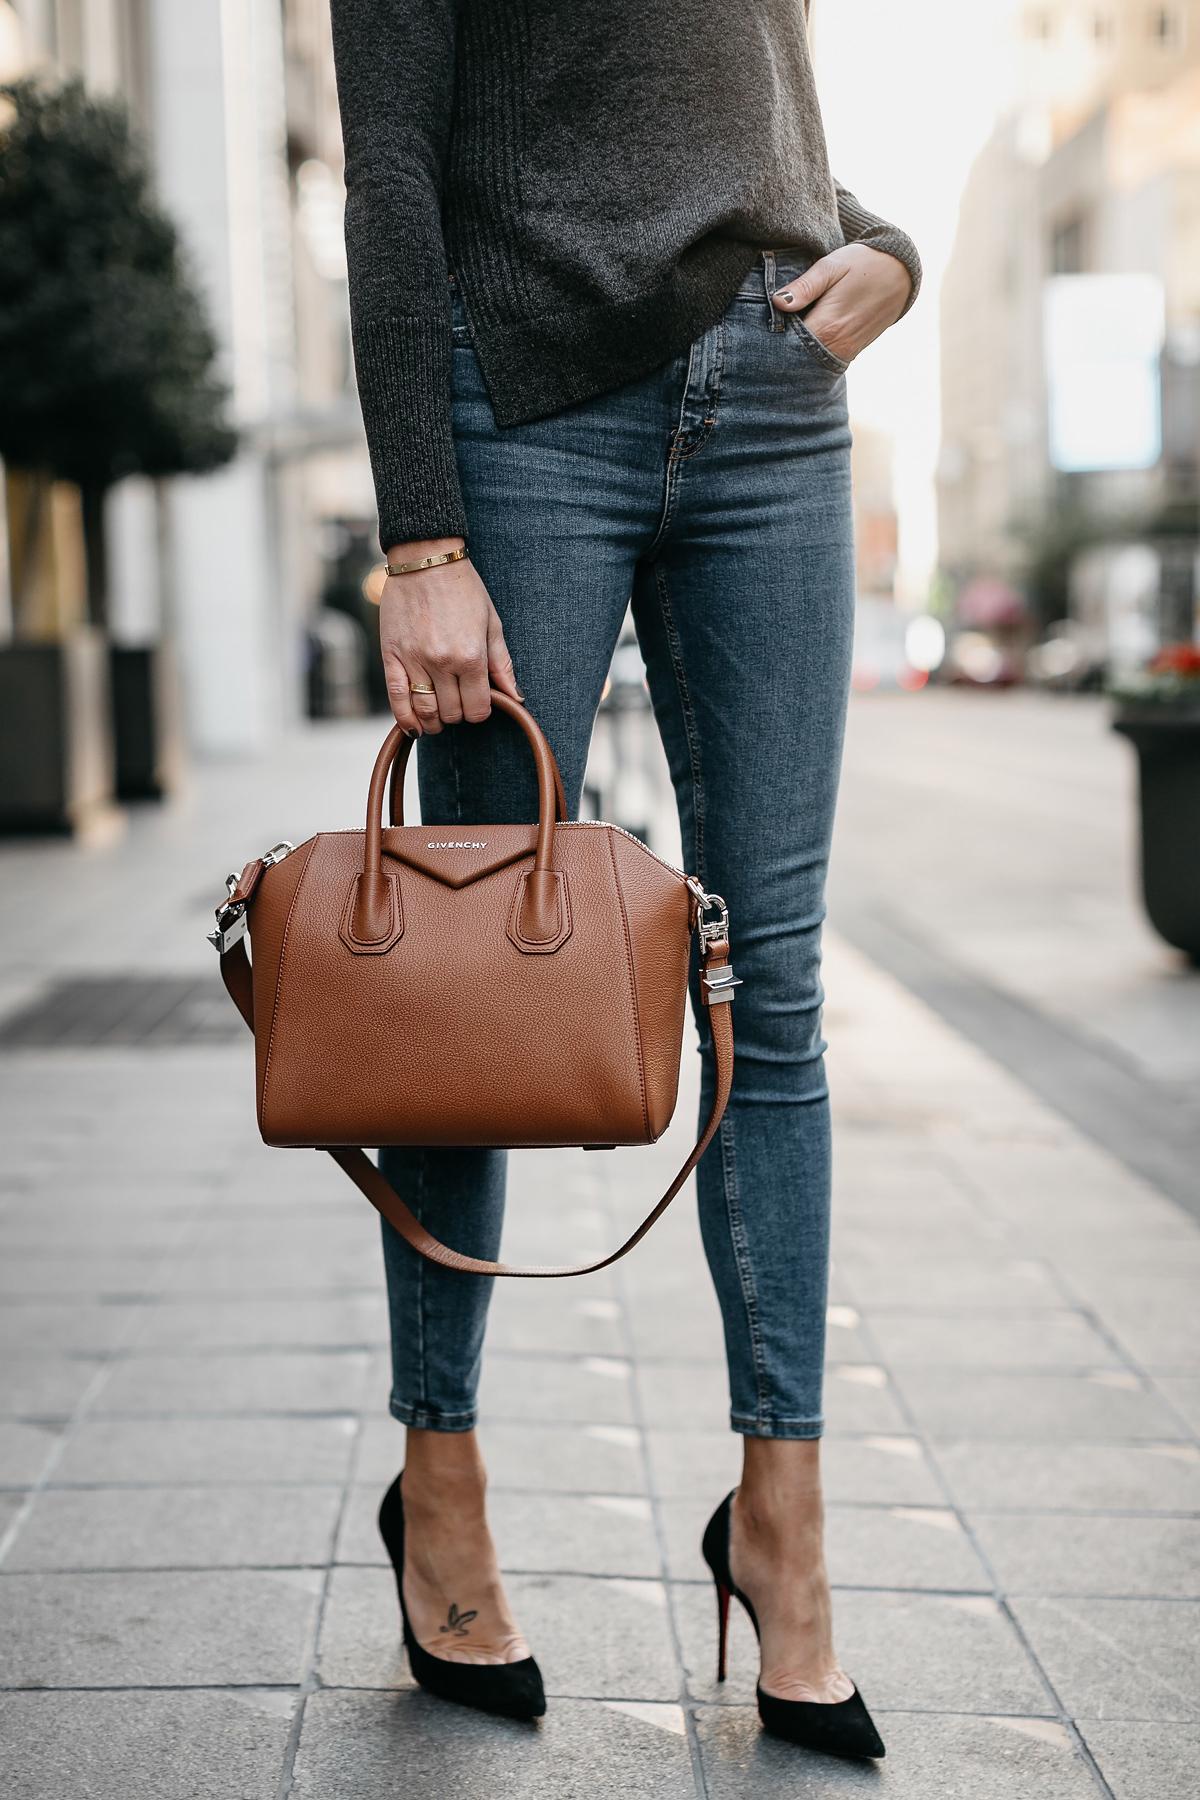 Grey Sweater Denim Skinny Jeans Givenchy Antigona Cognac Handbag Black Pumps Fashion Jackson Dallas Blogger Fashion Blogger Street Style